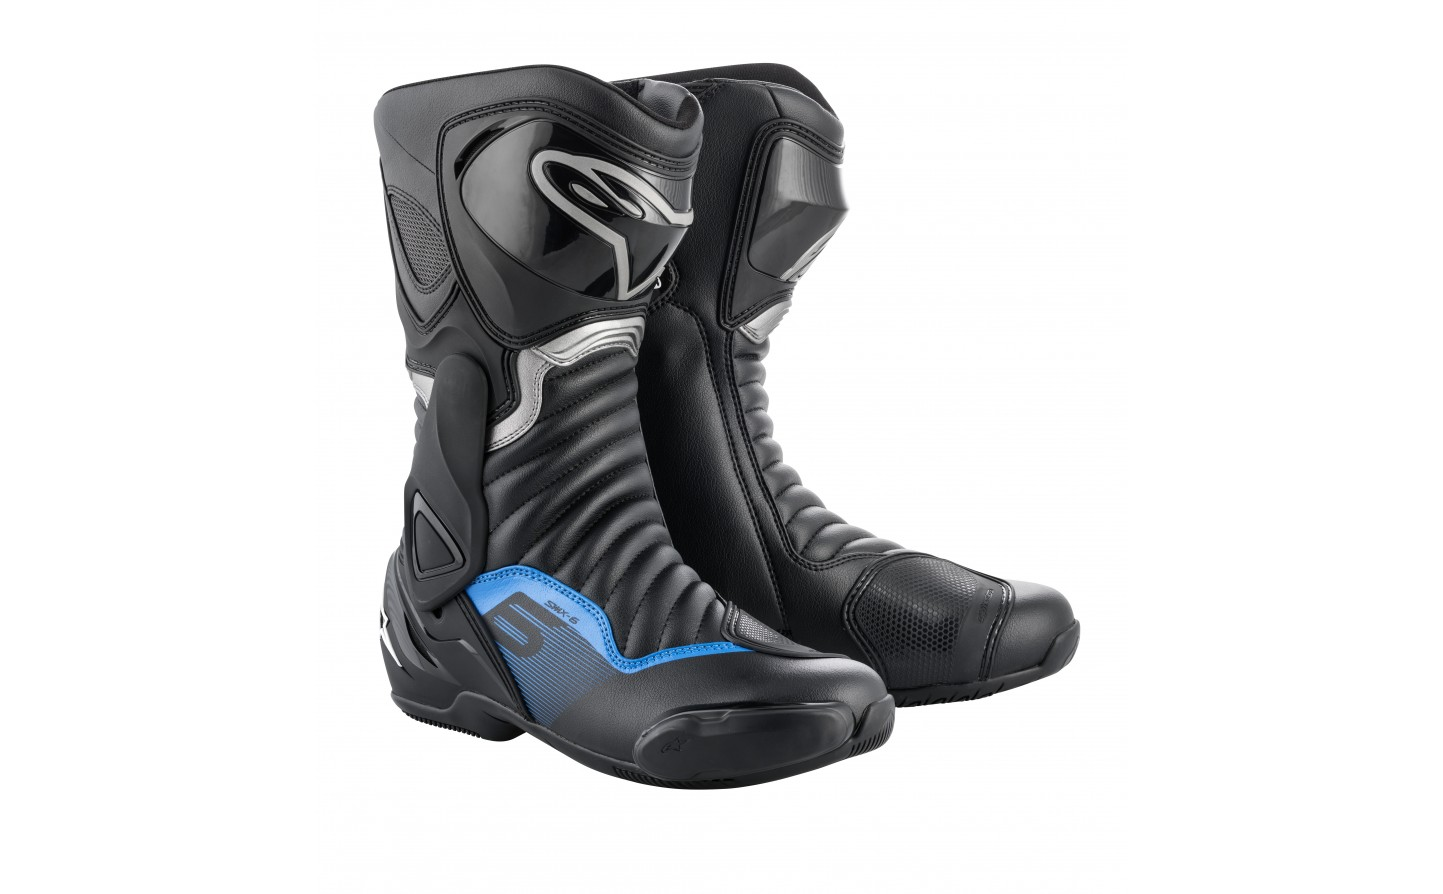 6 Negro Alpinestars Botas Metal V2 Azul2223017 1177 Smx Gun hQxsrdtC